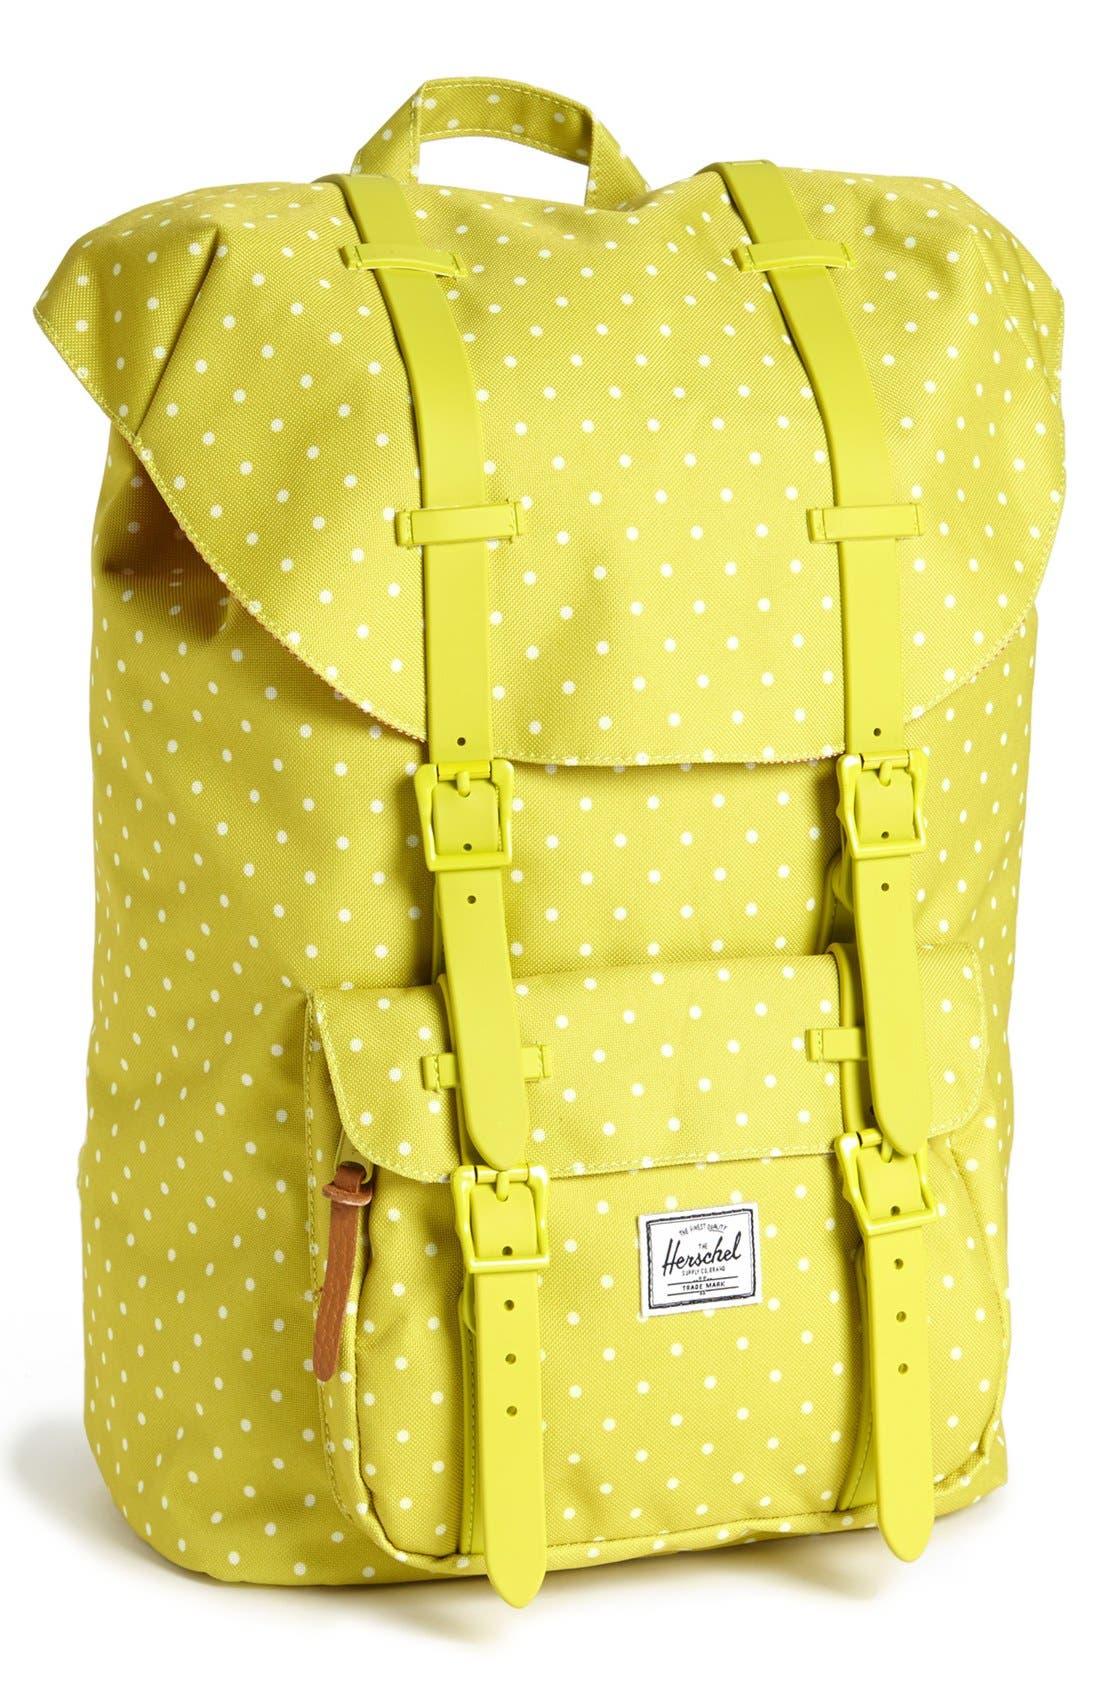 Alternate Image 1 Selected - Herschel Supply Co 'Little America - Mid' Backpack